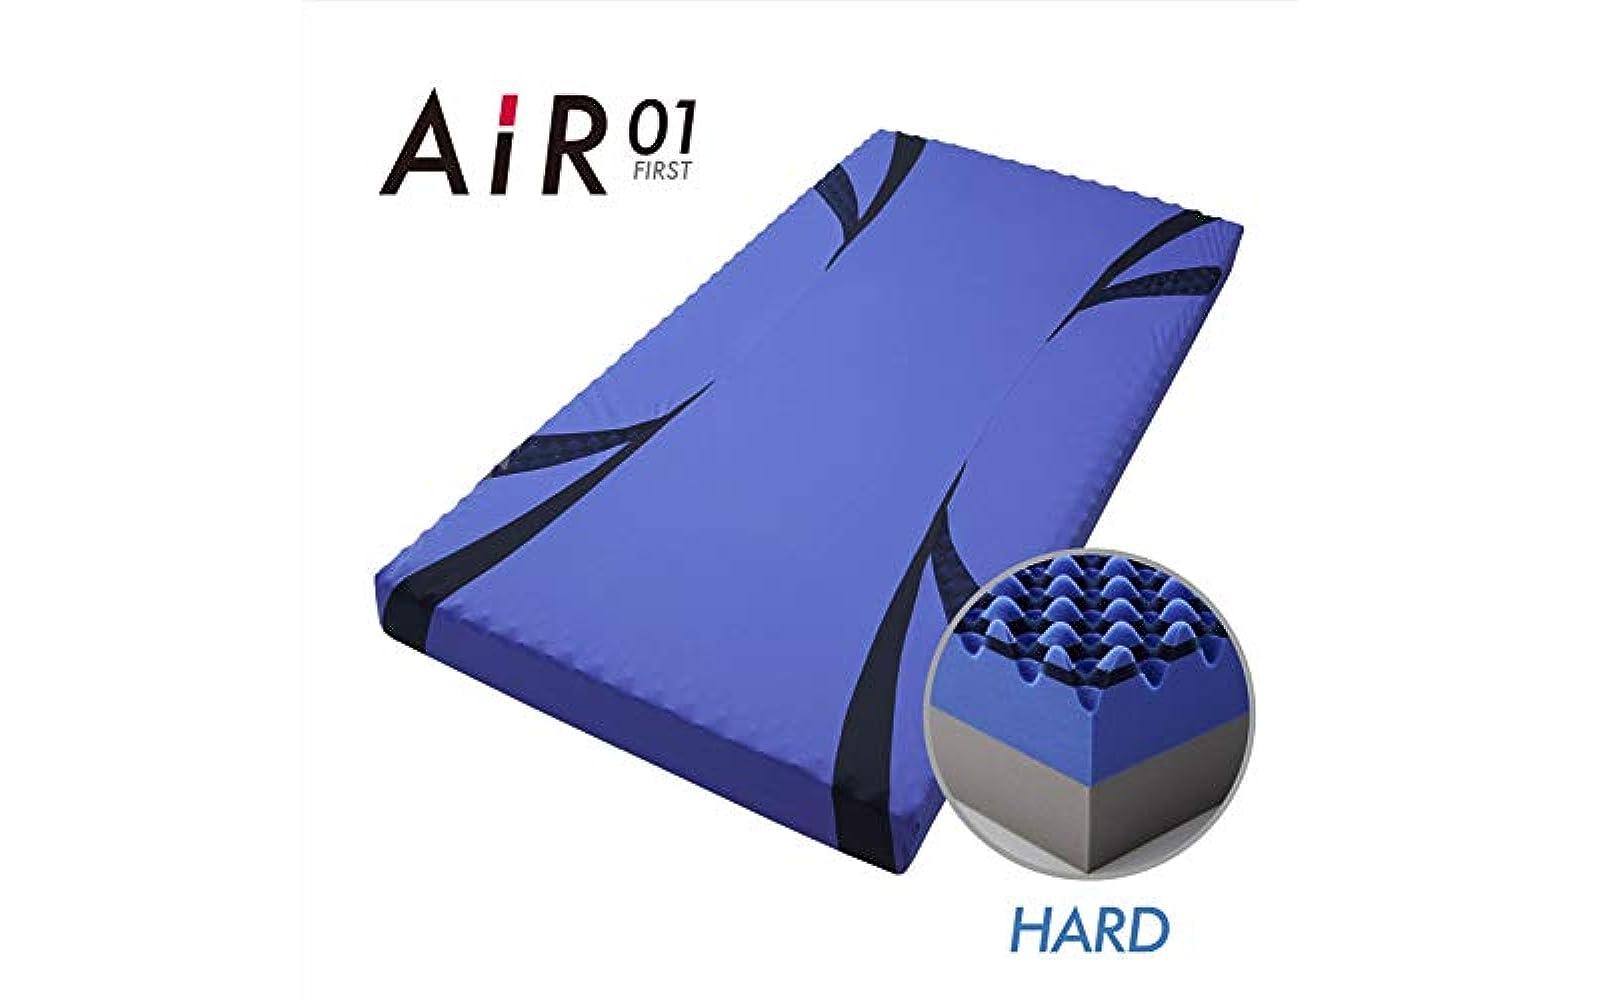 Air01 HARD セミダブル | Sleepee(スリーピー)